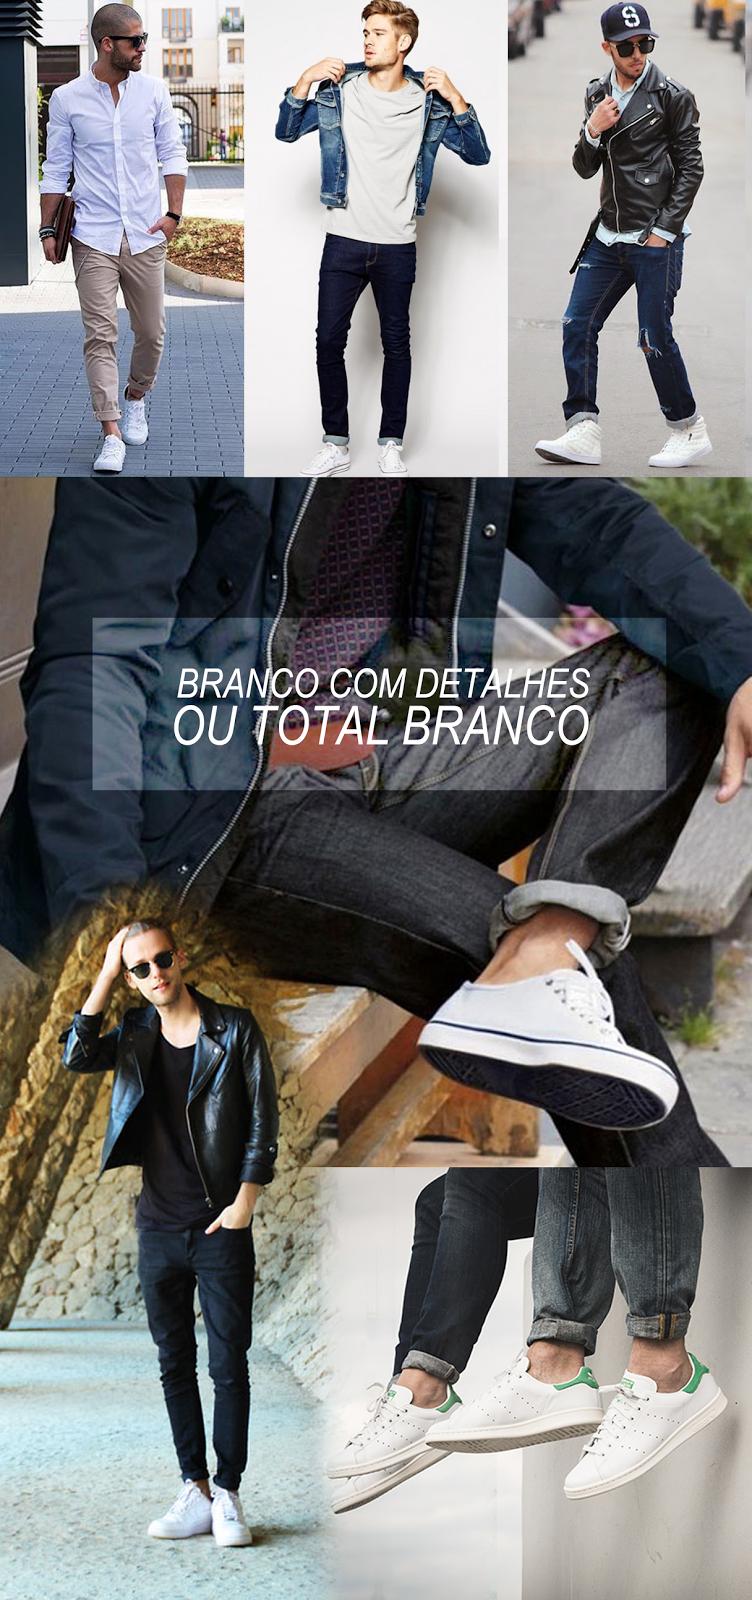 35a150c6e99 Conteúdo Masculino - Moda masculina   lifestyle  A tendência dos ...